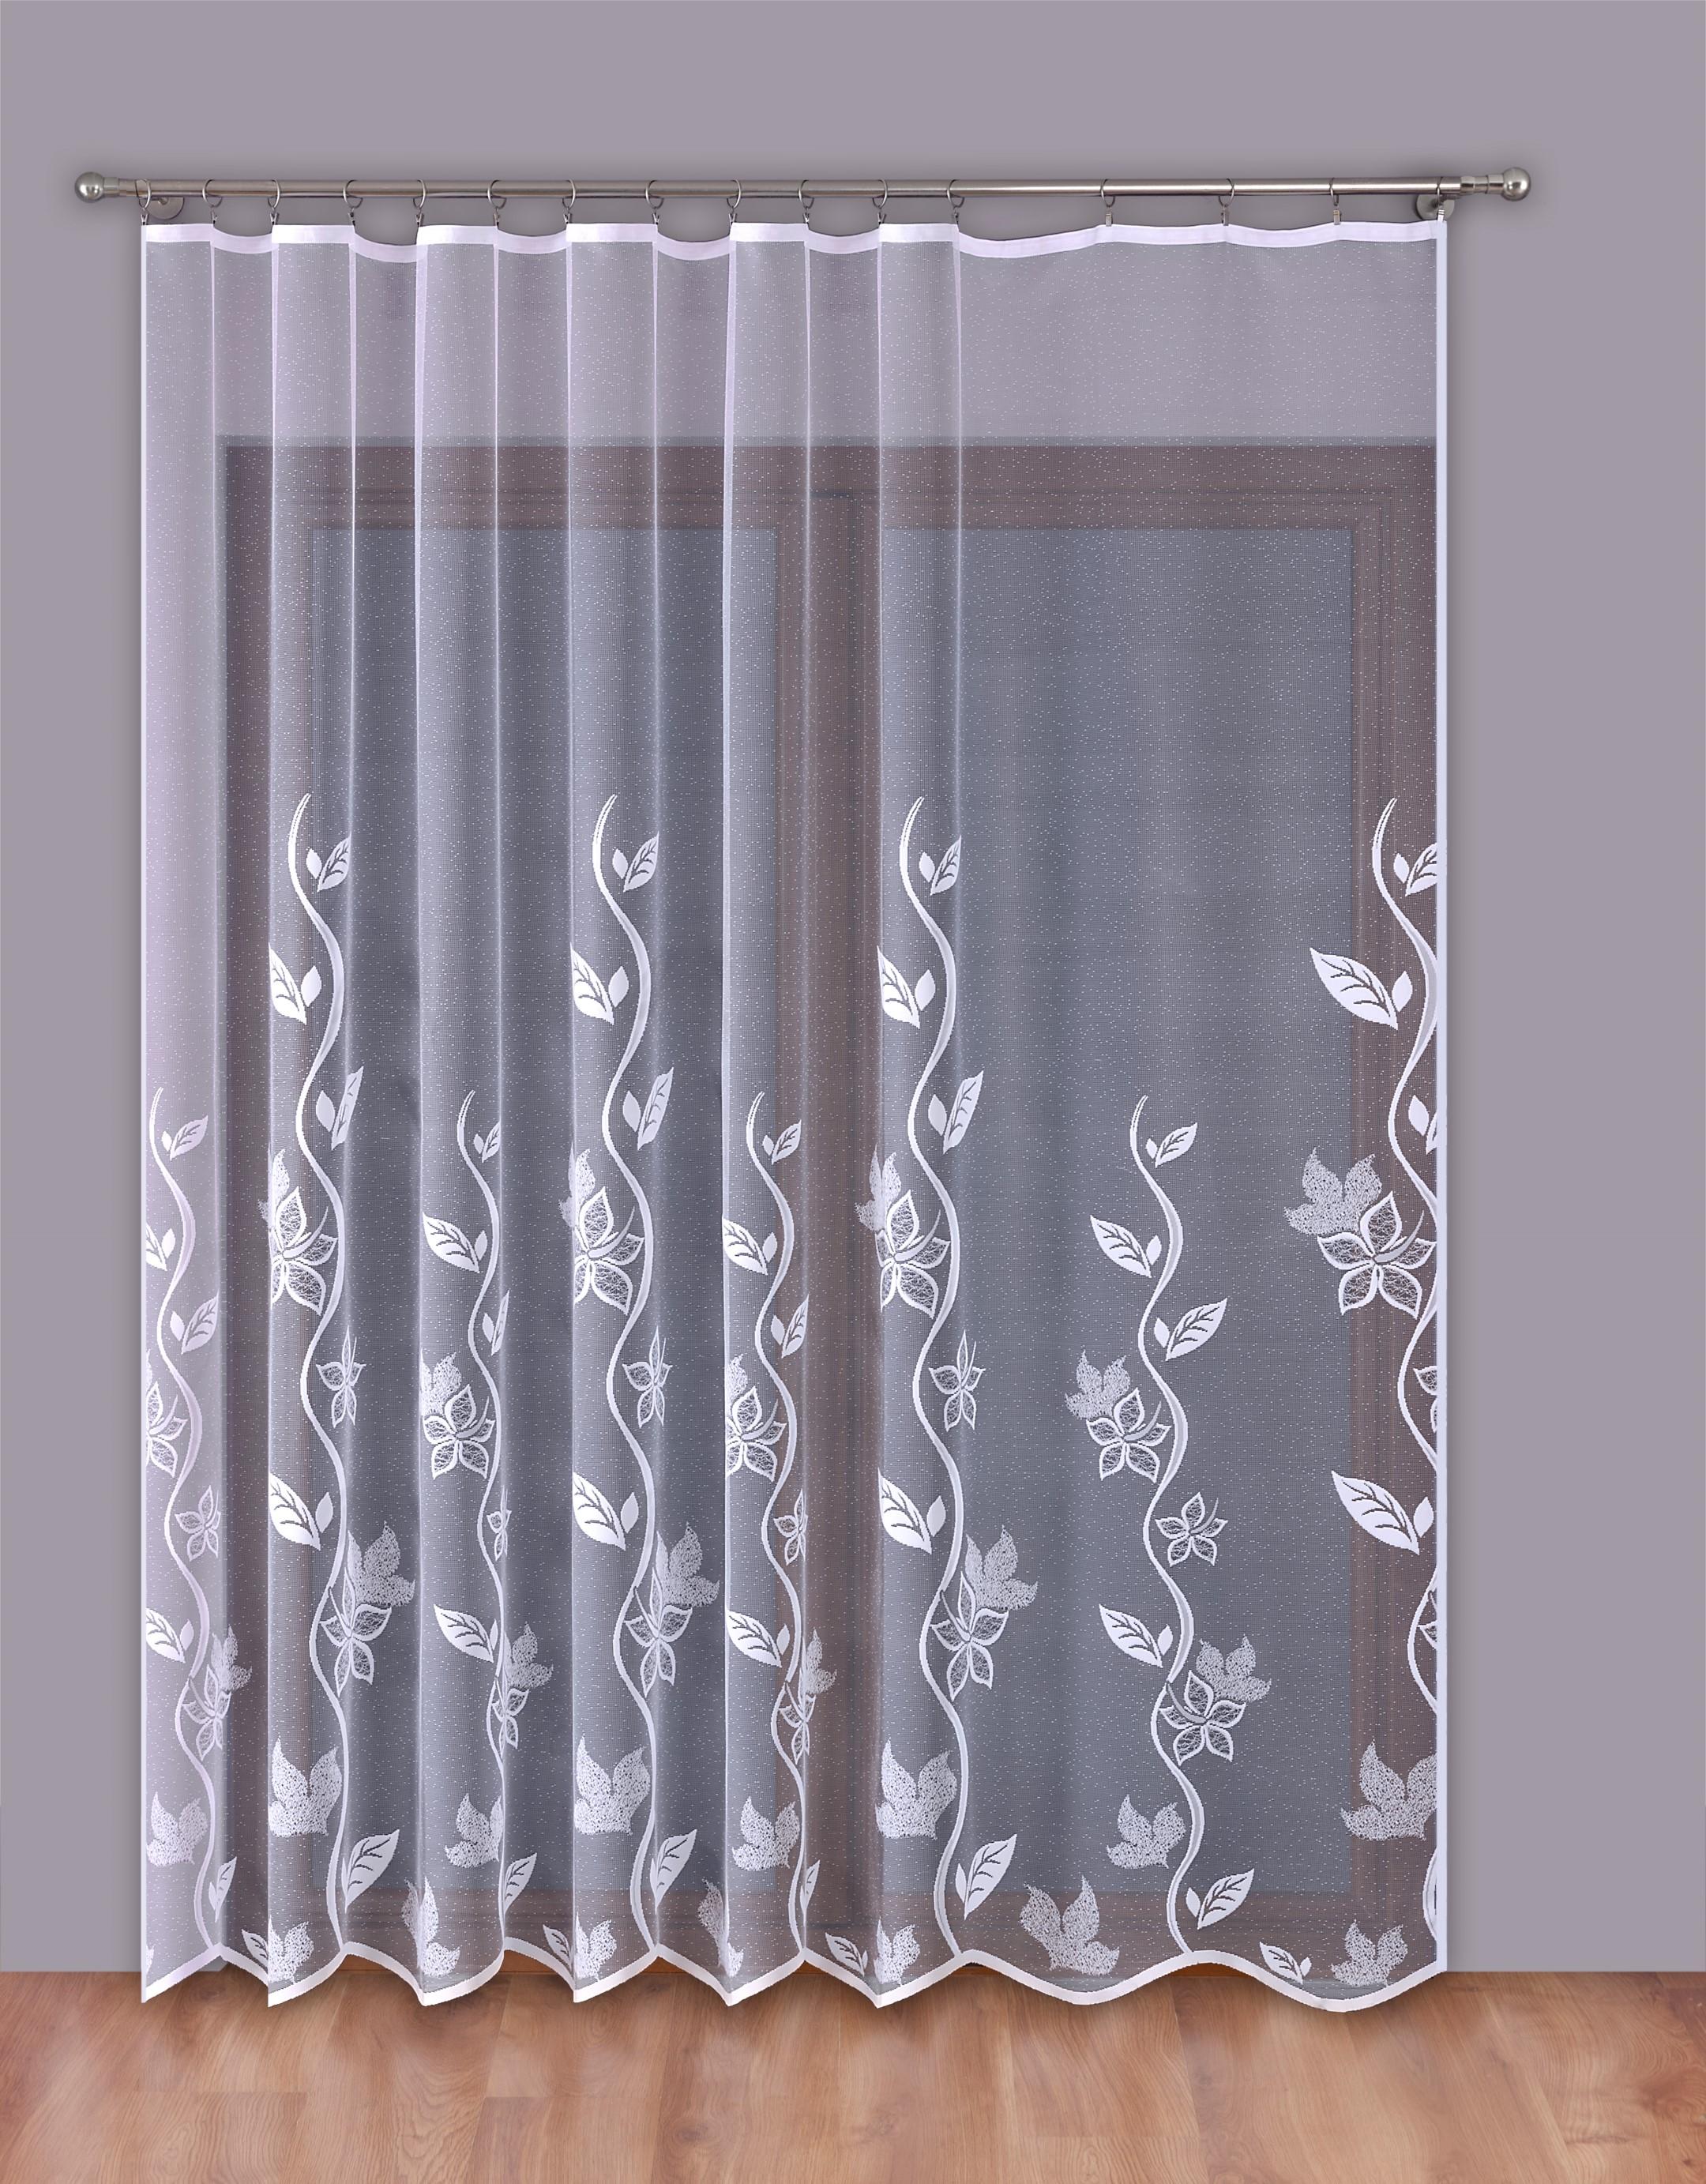 Шторы Primavera Классические шторы Gordie Цвет: Белый шторы primavera классические шторы maev цвет салатовый